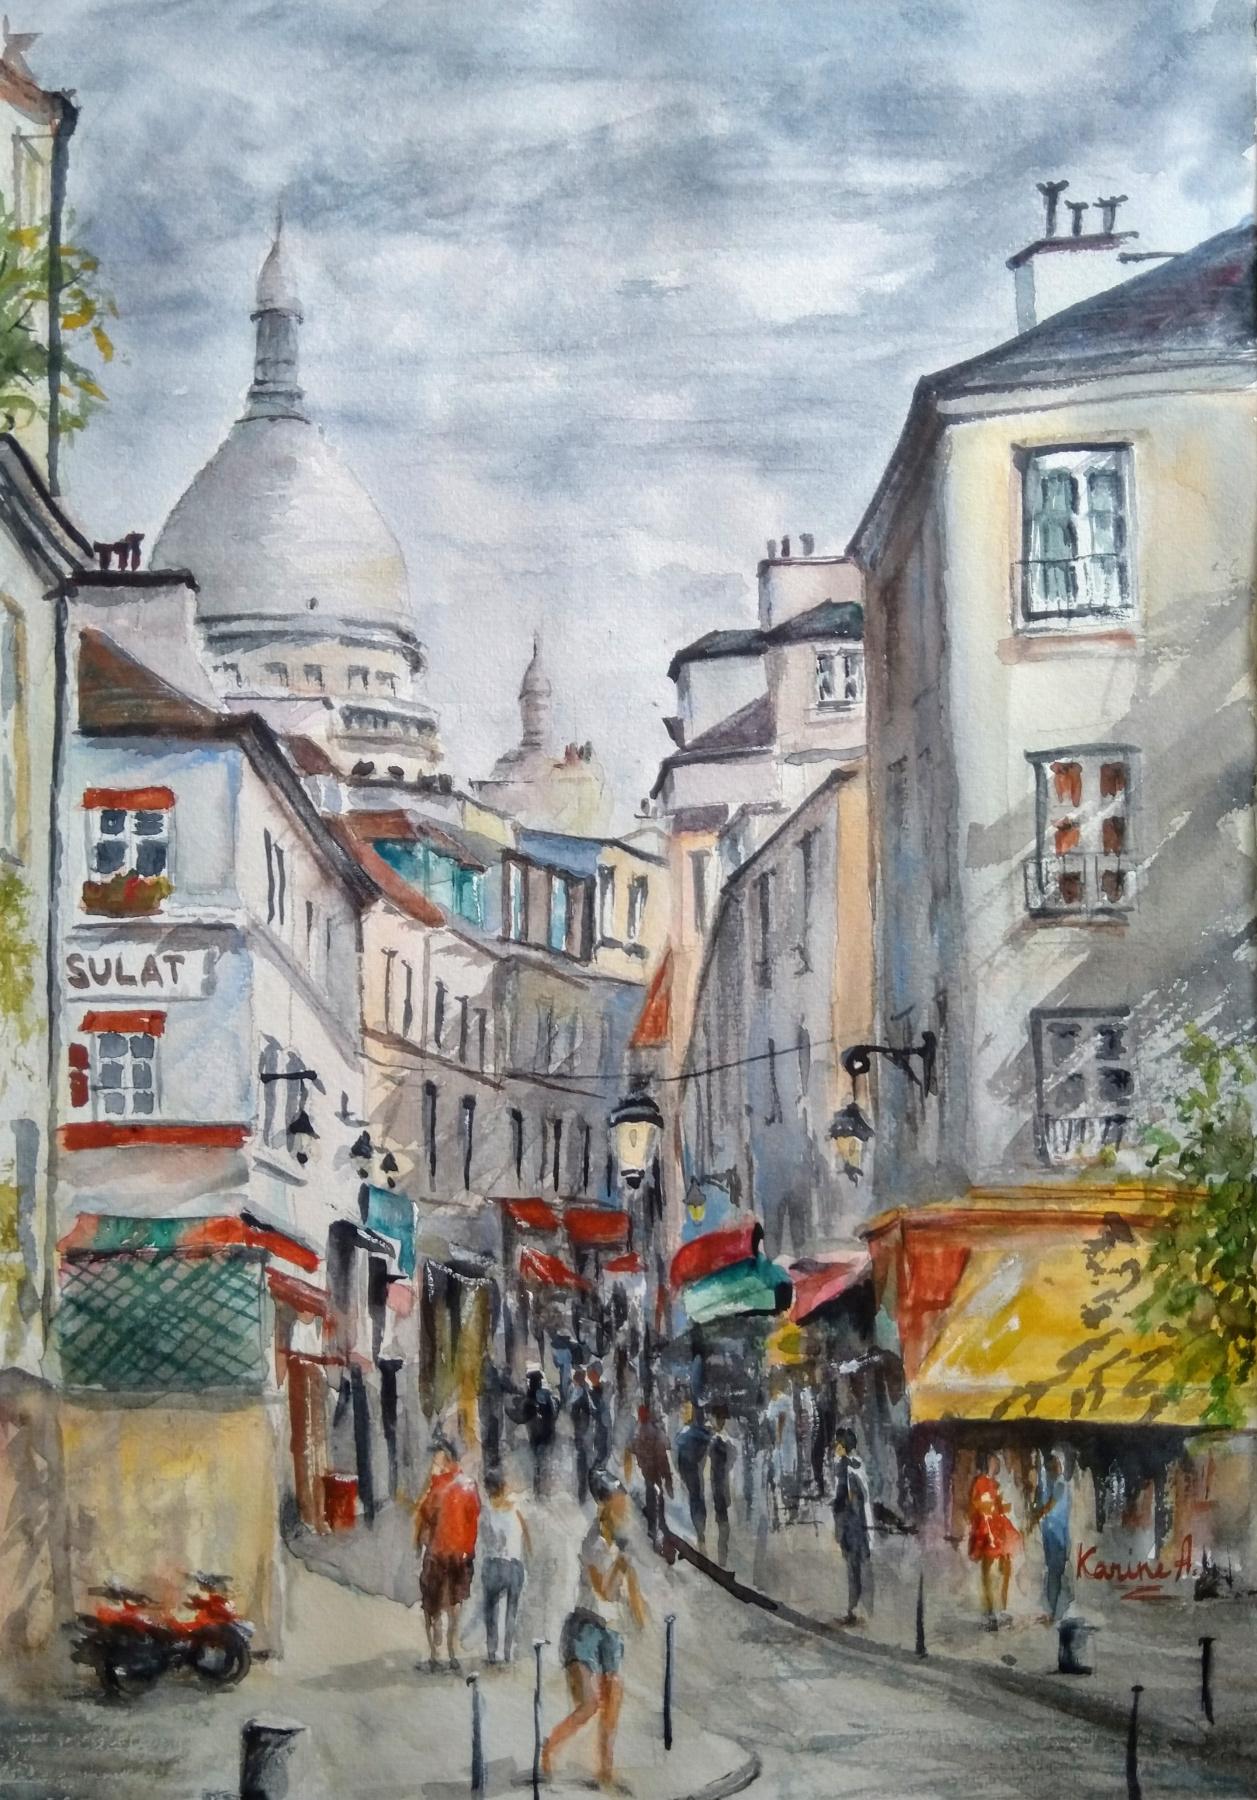 Karine Andriasyan. The beautiful chaos of Montmartre